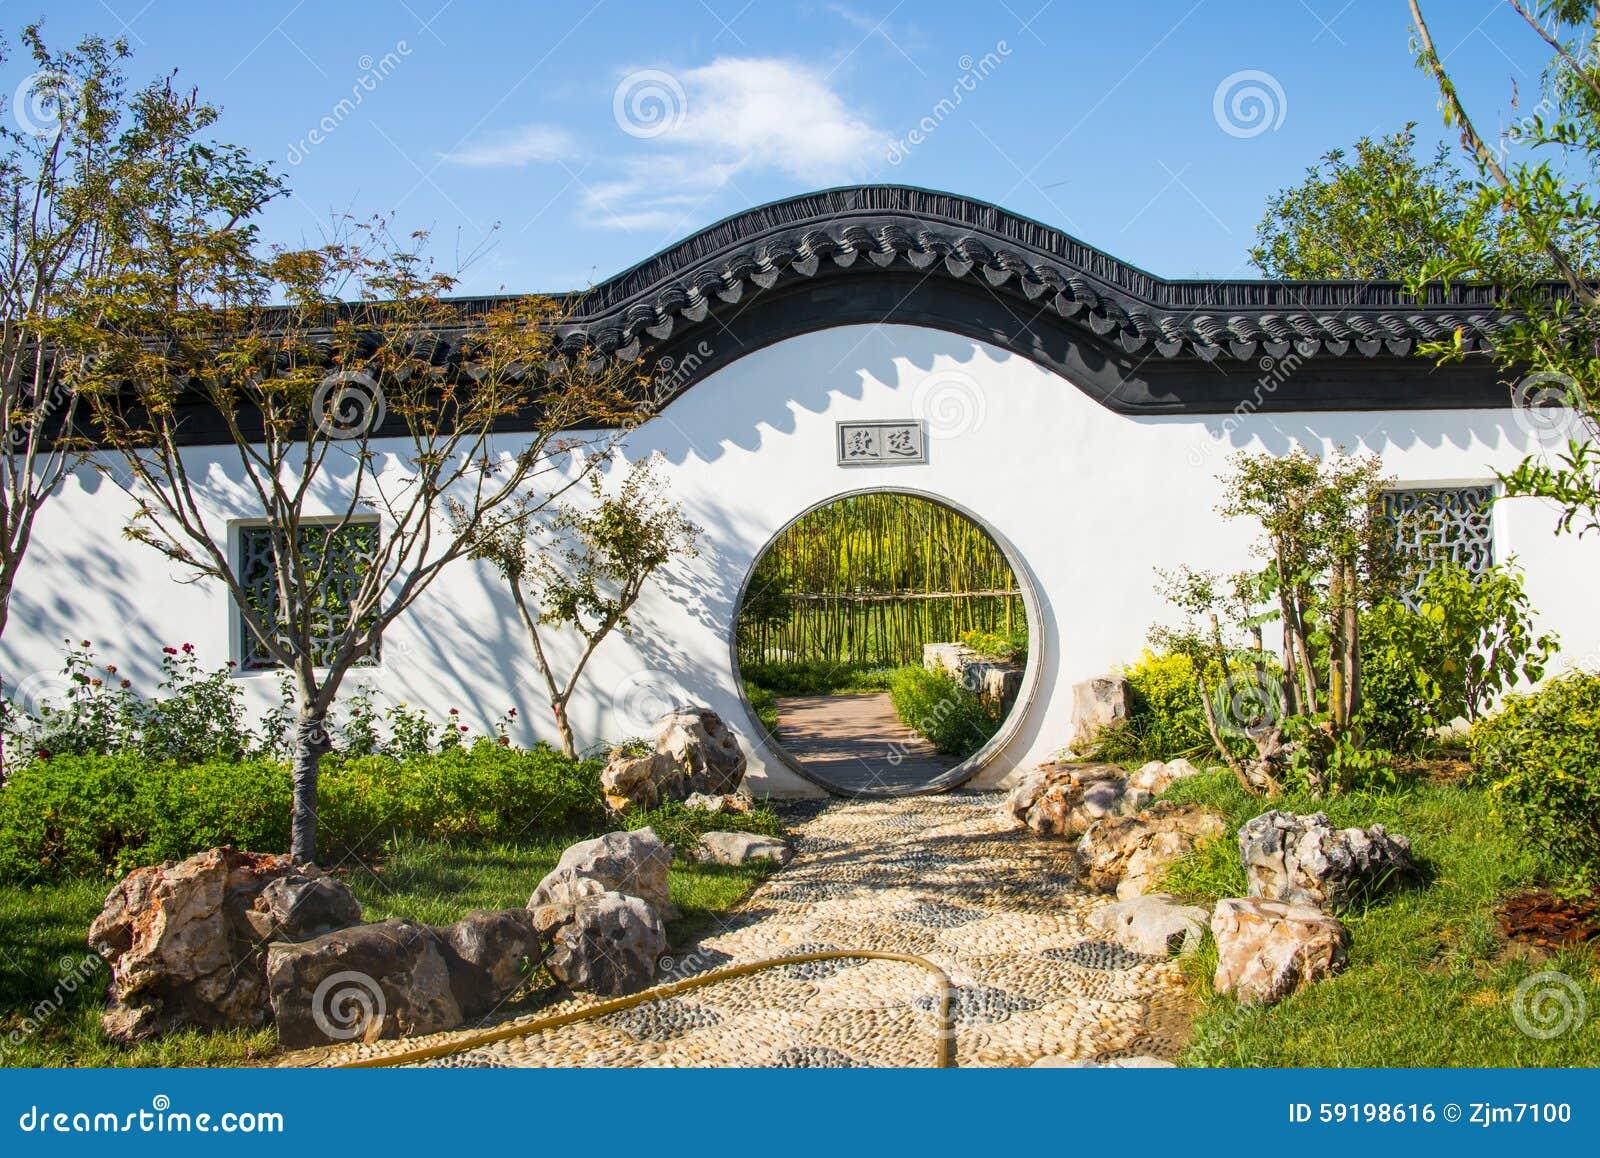 garden wall Asian